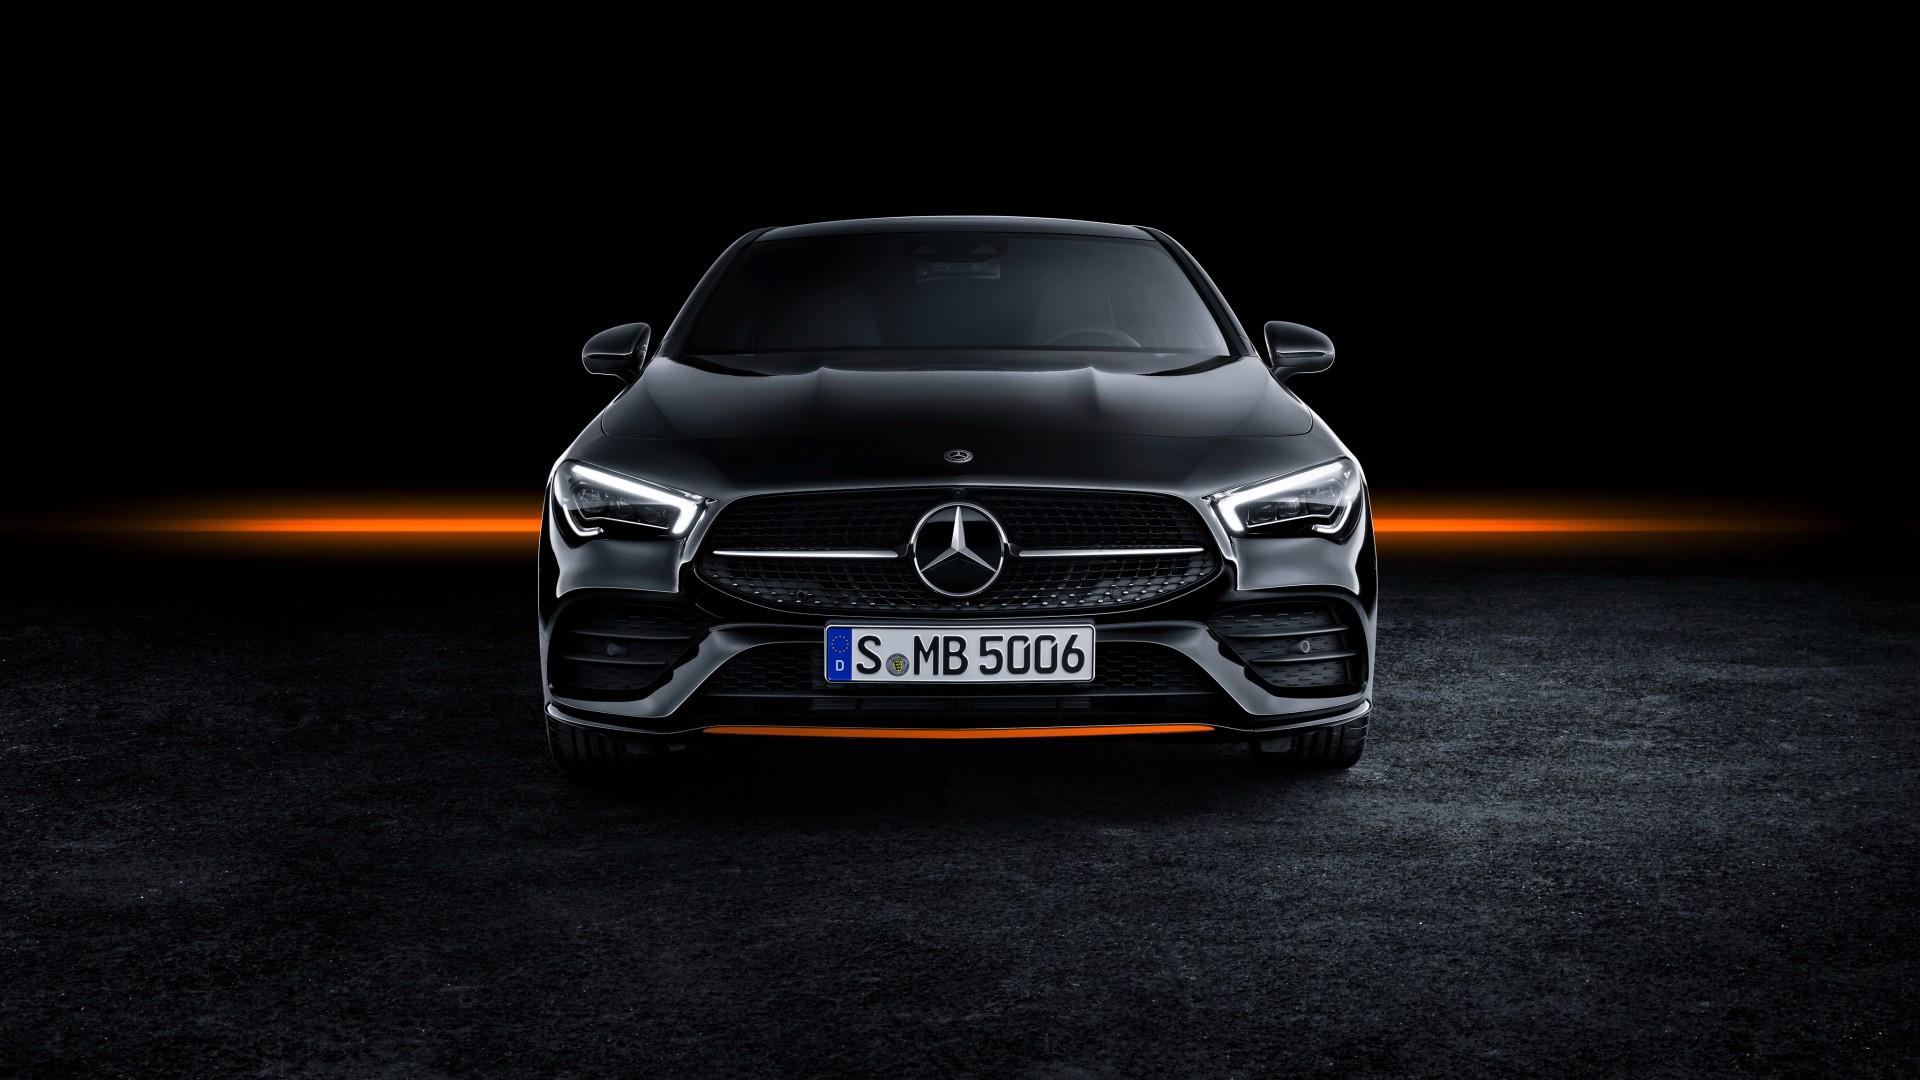 Cla 250 Coupe >> Mercedes-Benz CLA 250 AMG Line Edition Orange Art 2019 4K 2 Wallpaper | HD Car Wallpapers | ID ...